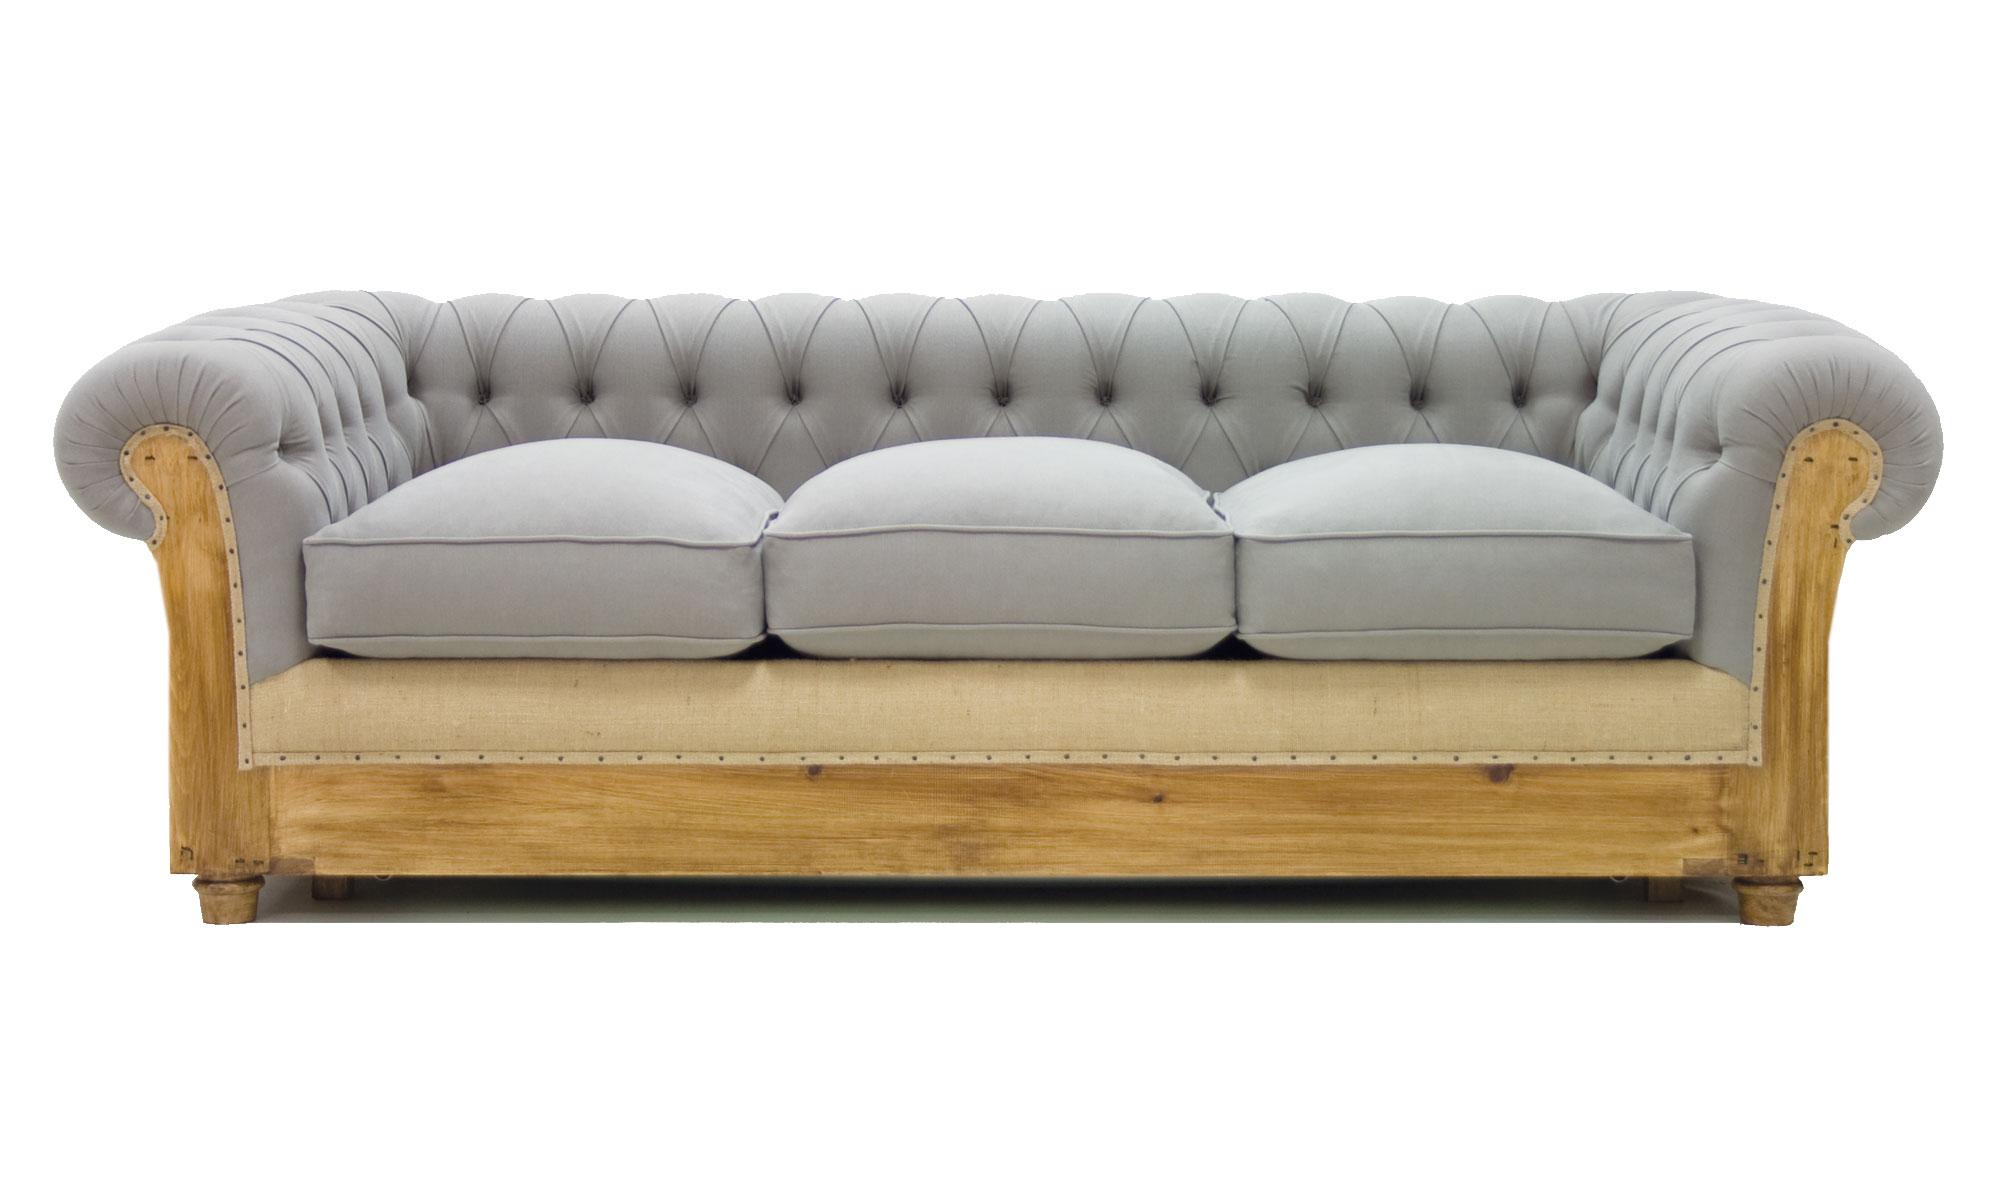 Sof cama gris chesterfield chesire en - Muebles sofas camas ...